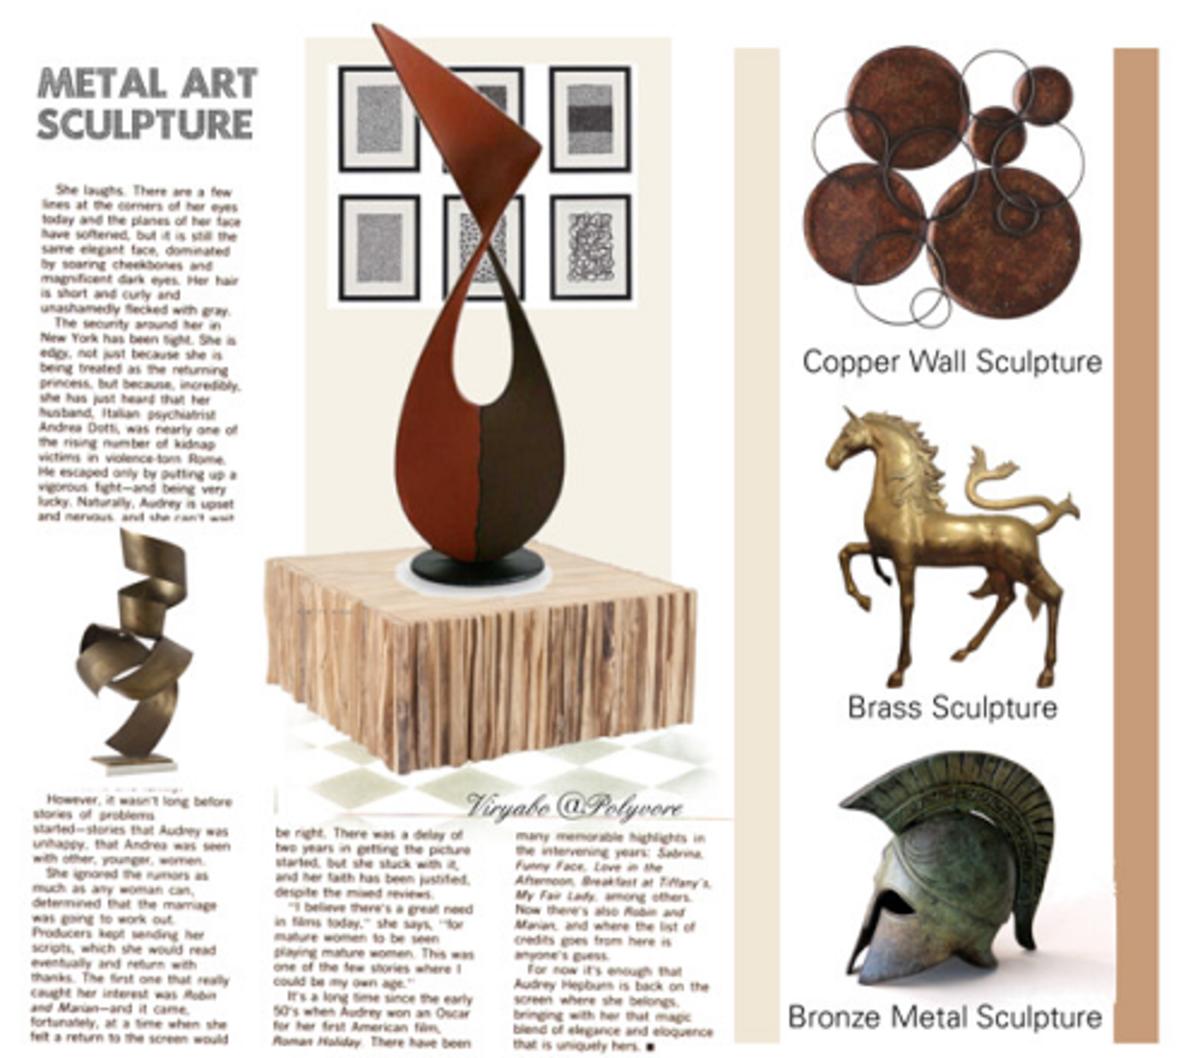 metal-art-decorative-uses-of-iron-tin-lead